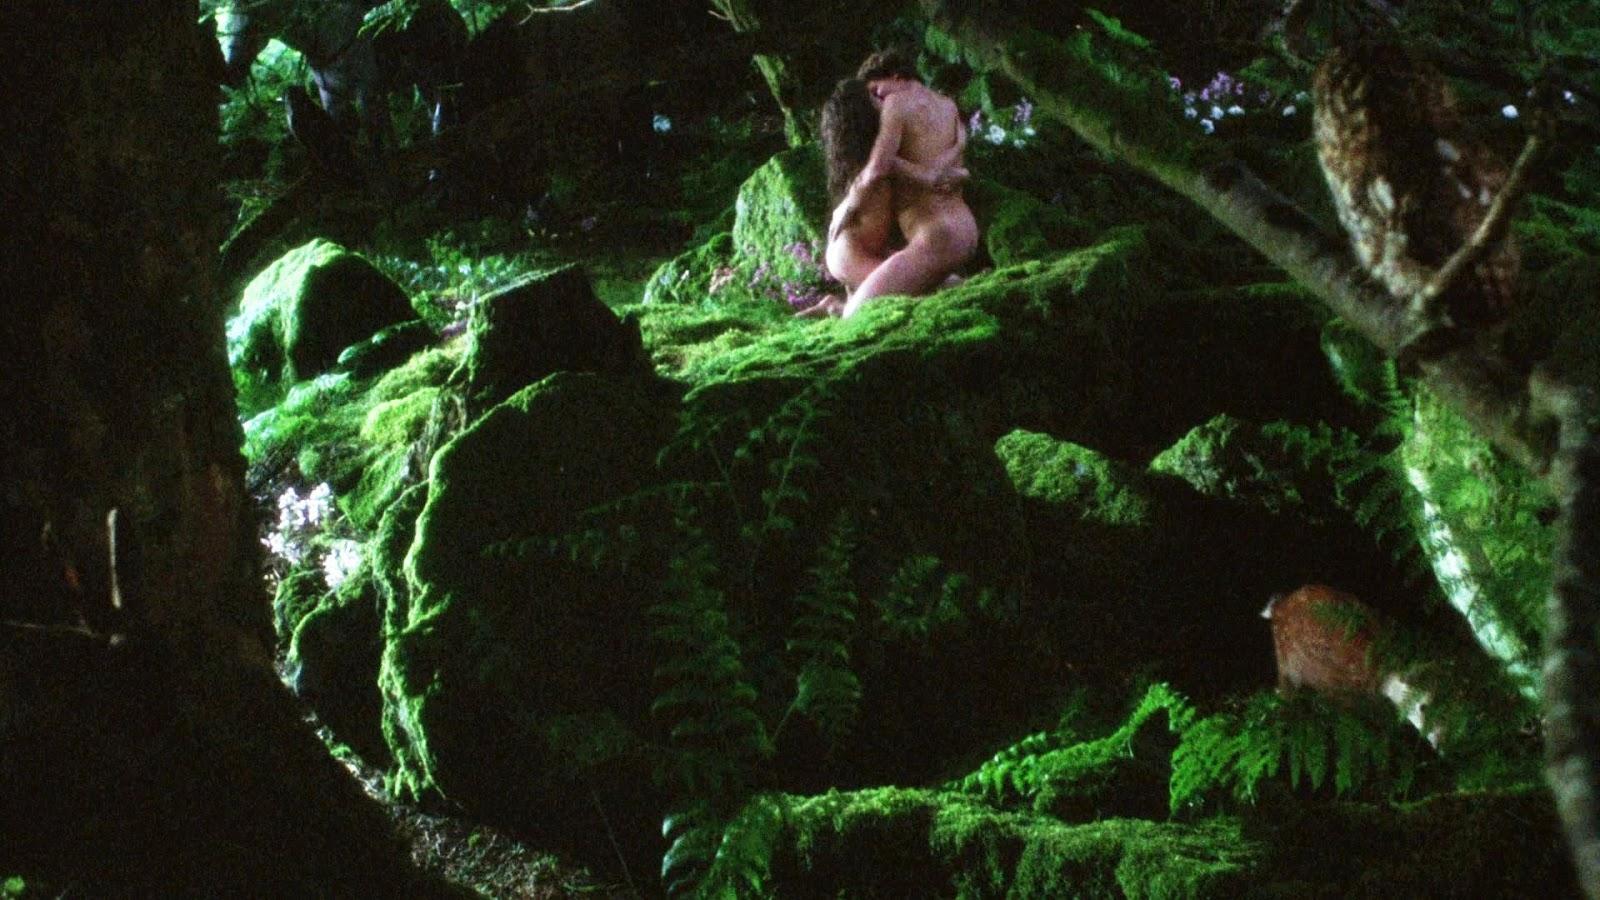 Excalibur Movie Sex Scene mjolnir magazine: film review: excalibur, further right than